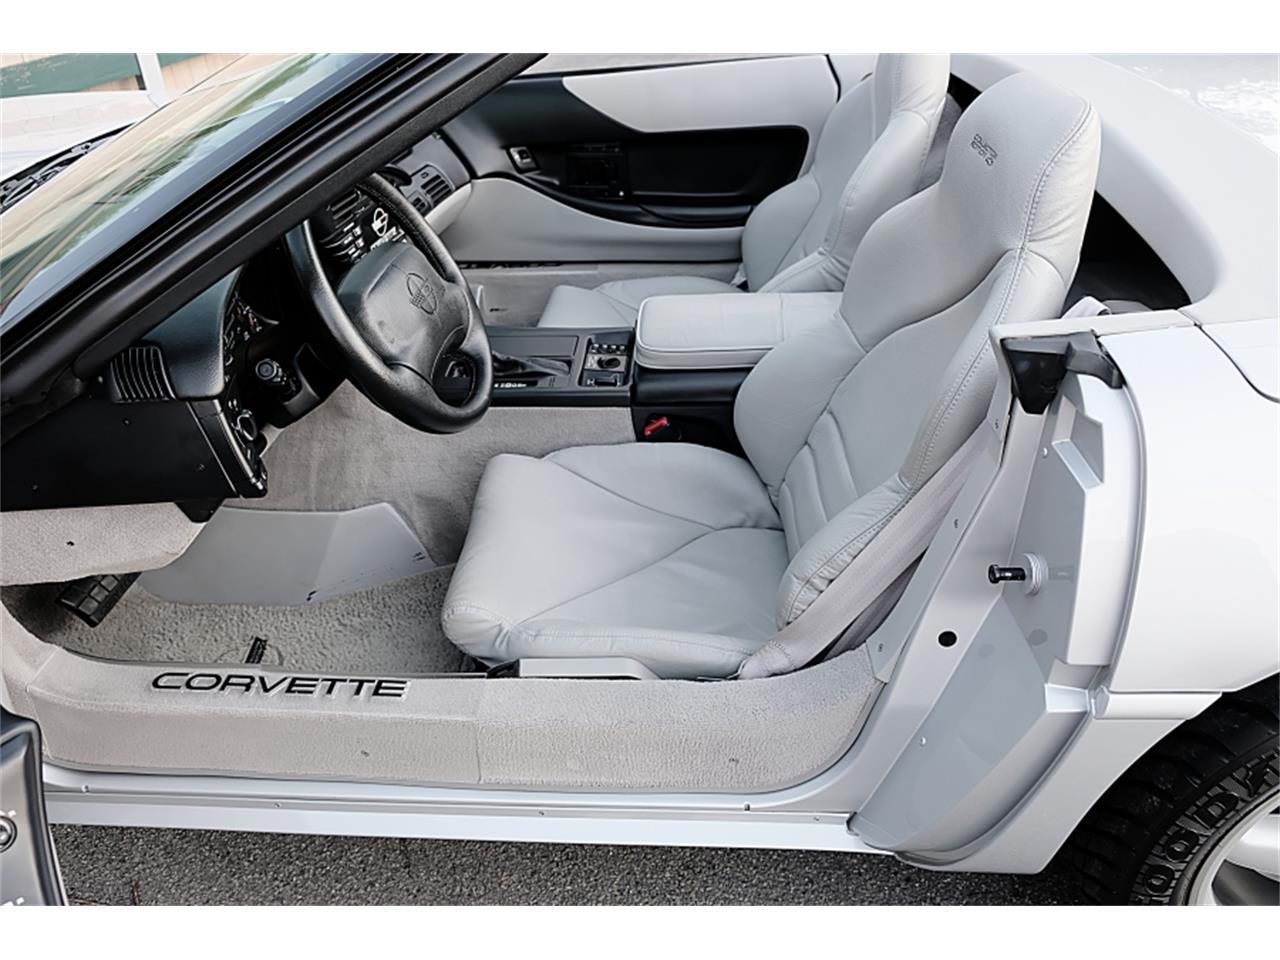 1996 Chevrolet Corvette (CC-1355024) for sale in Old Forge, Pennsylvania